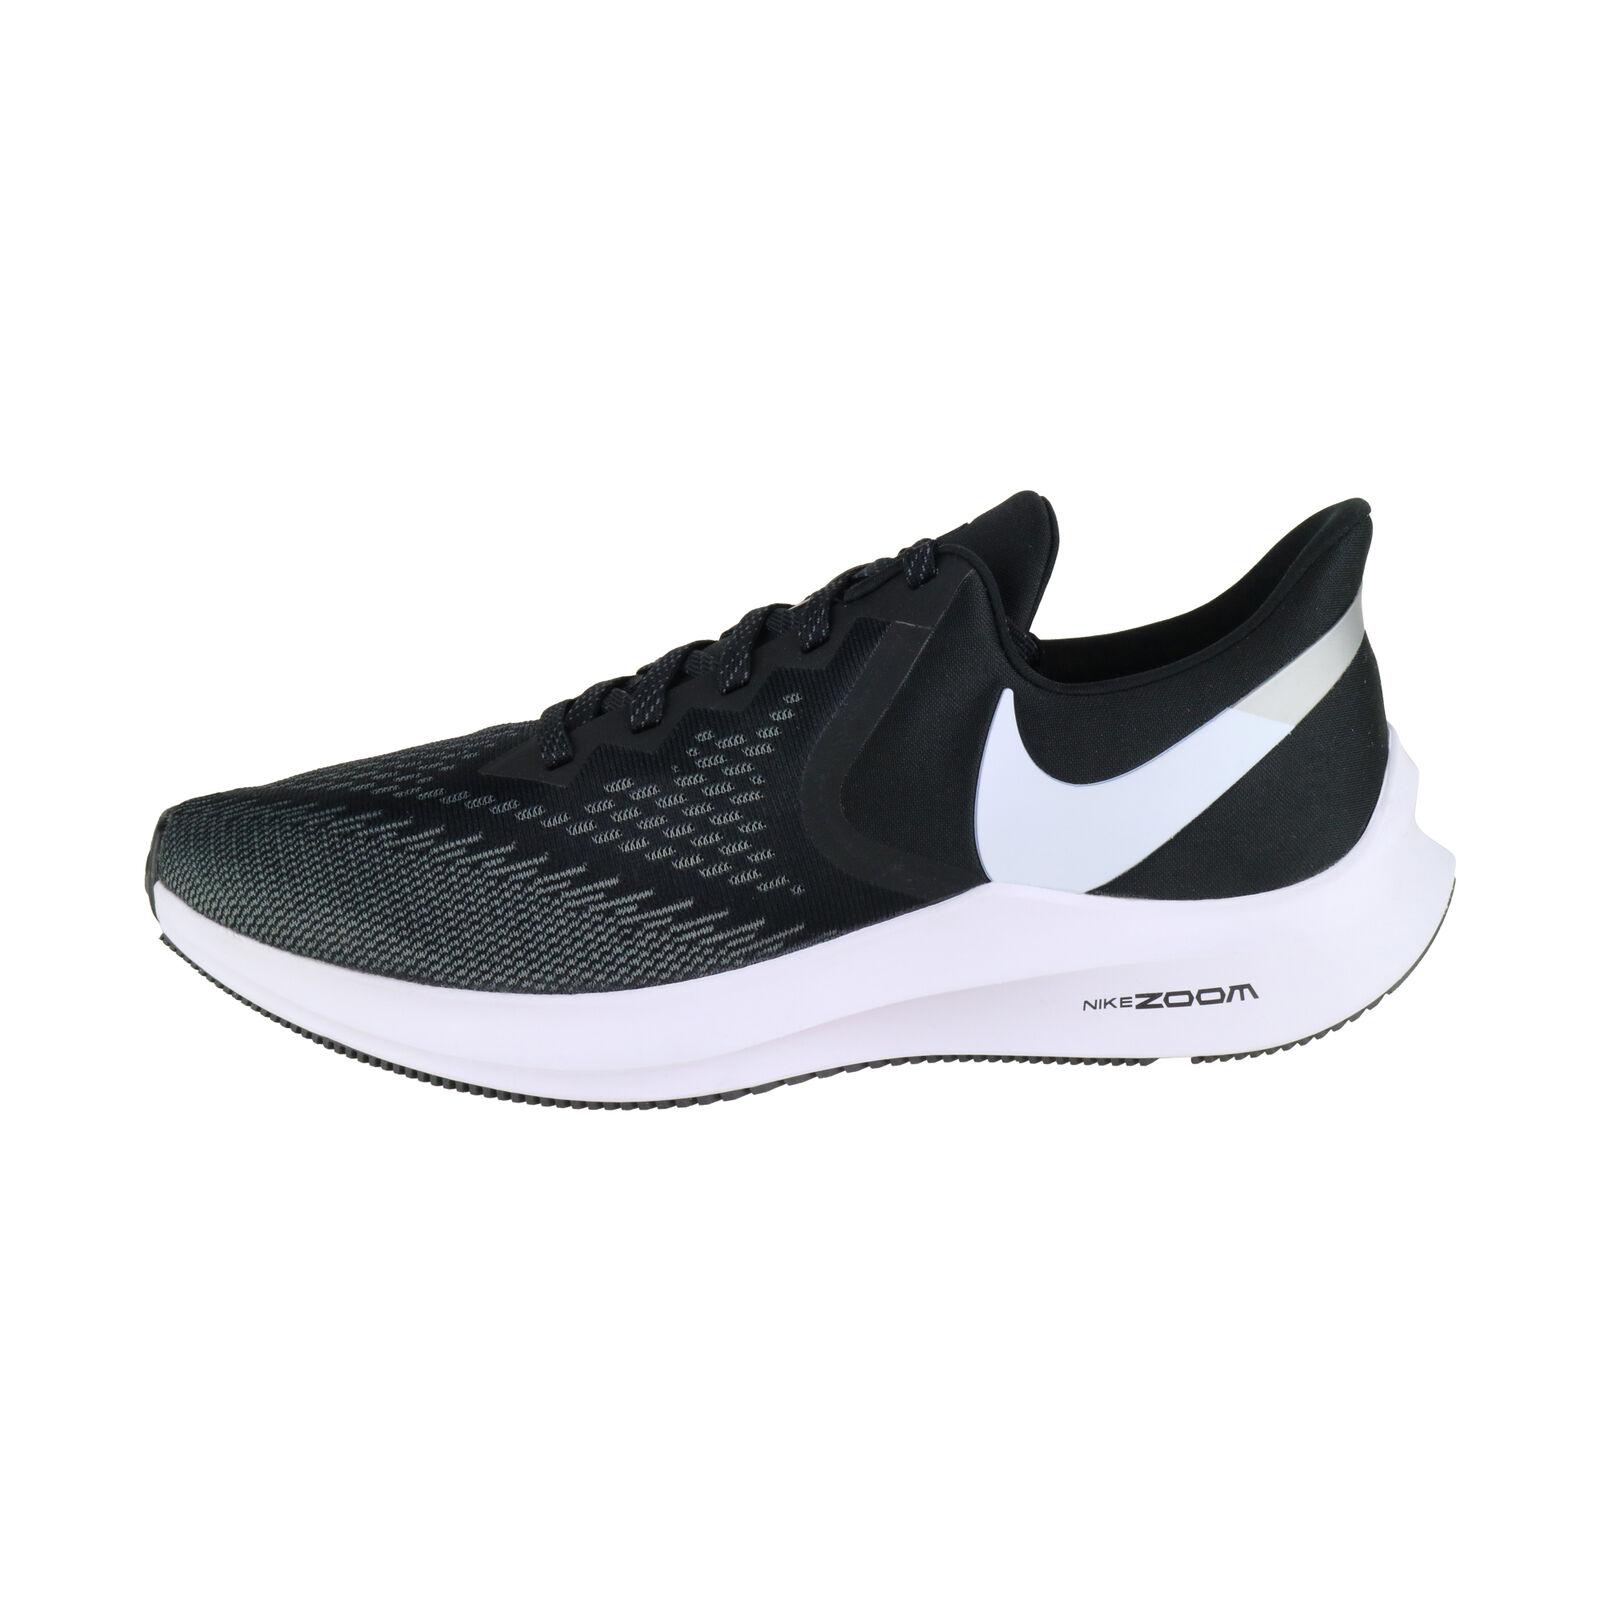 Nike Air zoom winflo 6 negro blancoo aq7497-001